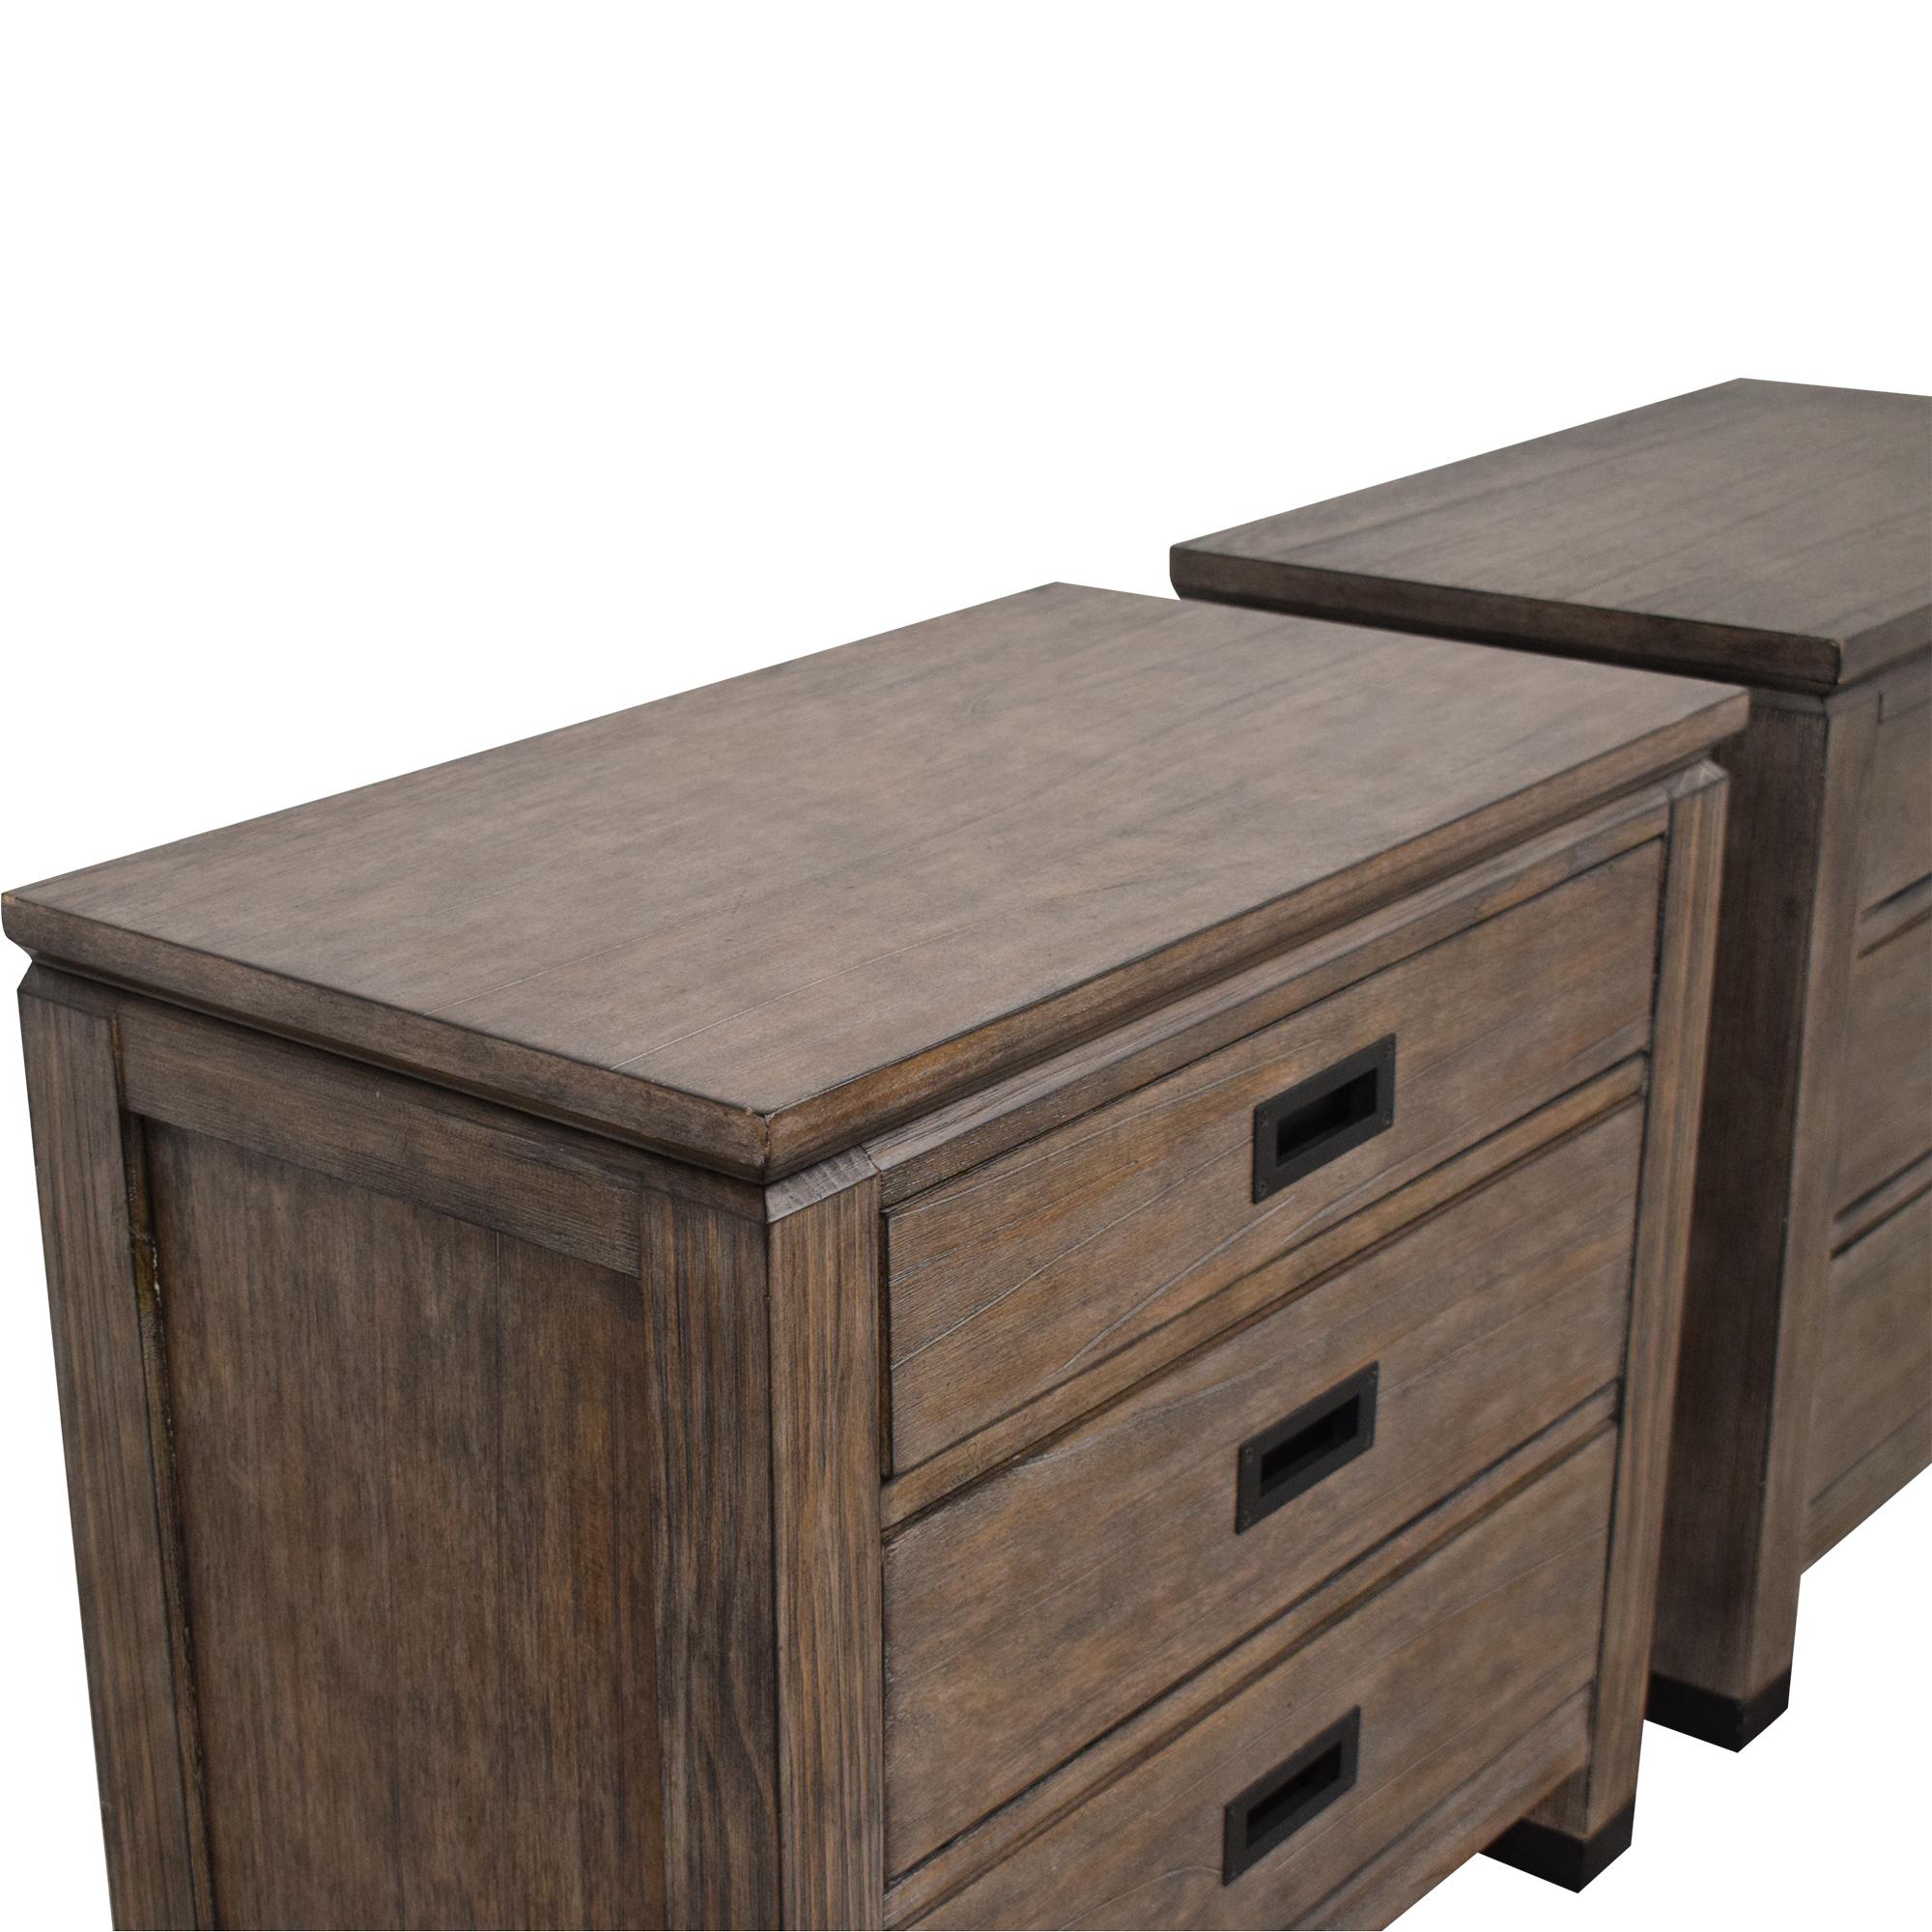 Coaster Fine Furniture Coaster Fine Furniture Furniture Meester Night Stands price